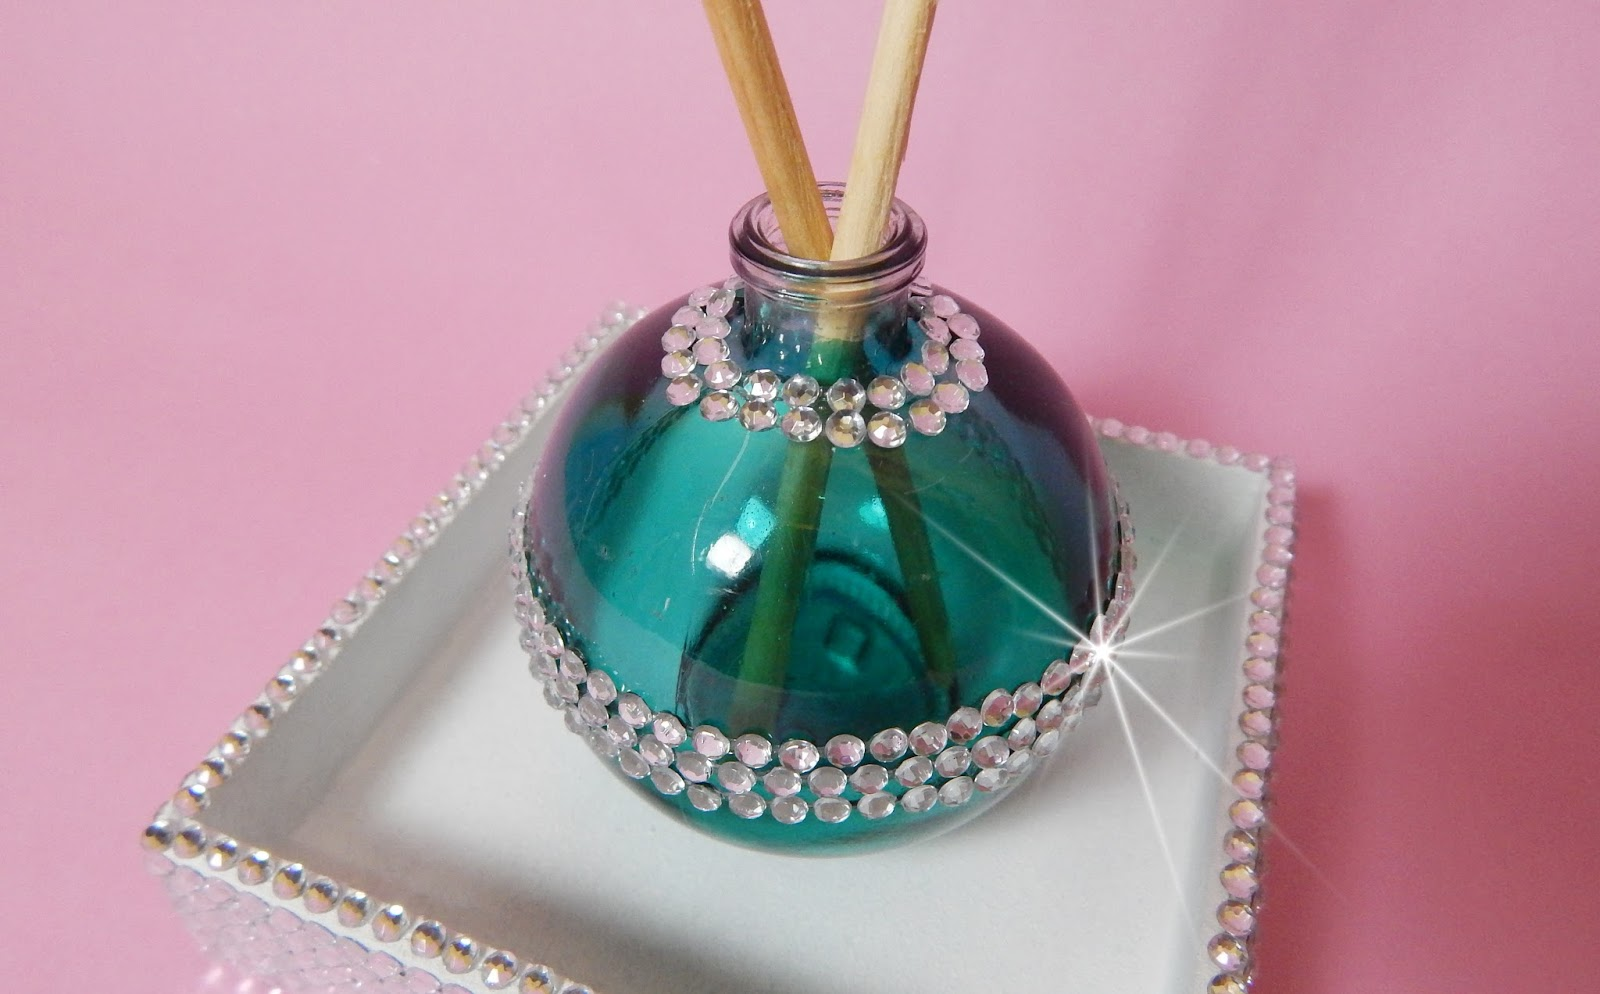 Adesivos De Parede Personalizados Infantil ~ Como reutilizar vidro de perfume e fazer kit aromatizador para casa D Mimos e Sonhos Ateli u00ea